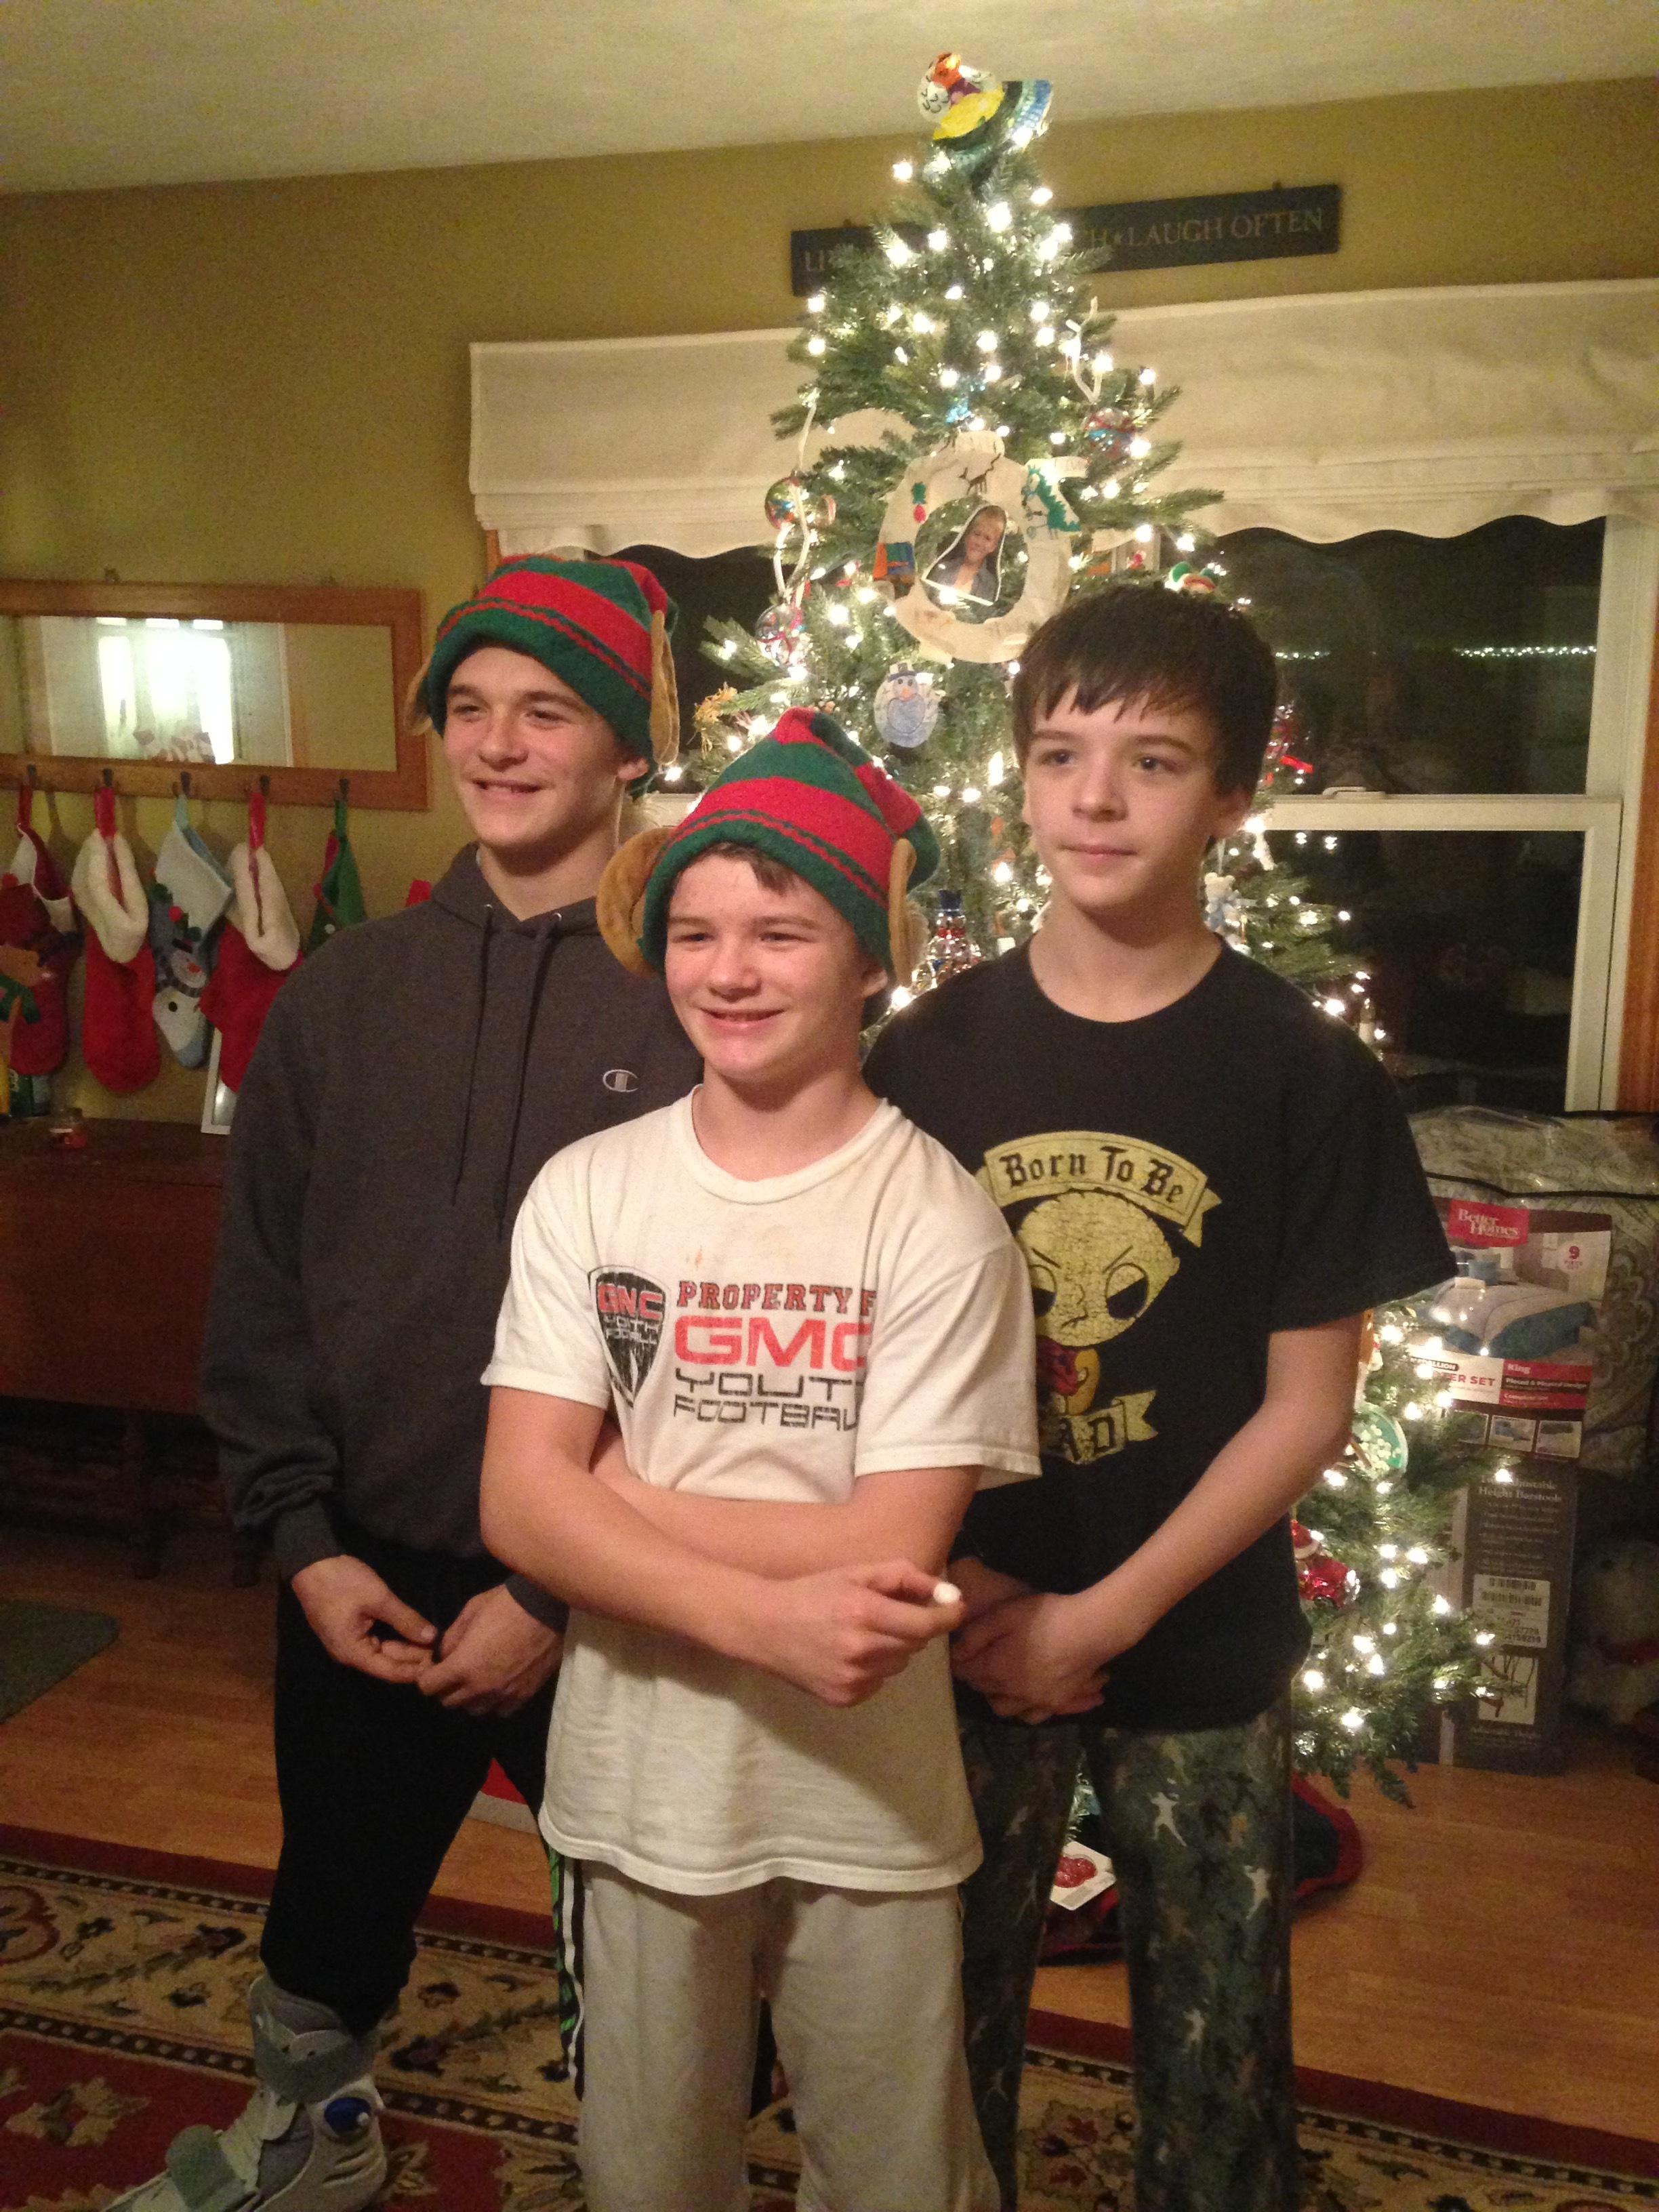 Mike's three sons, Luke (17), Mason (14), and Joseph (15) at Christmas, 2016